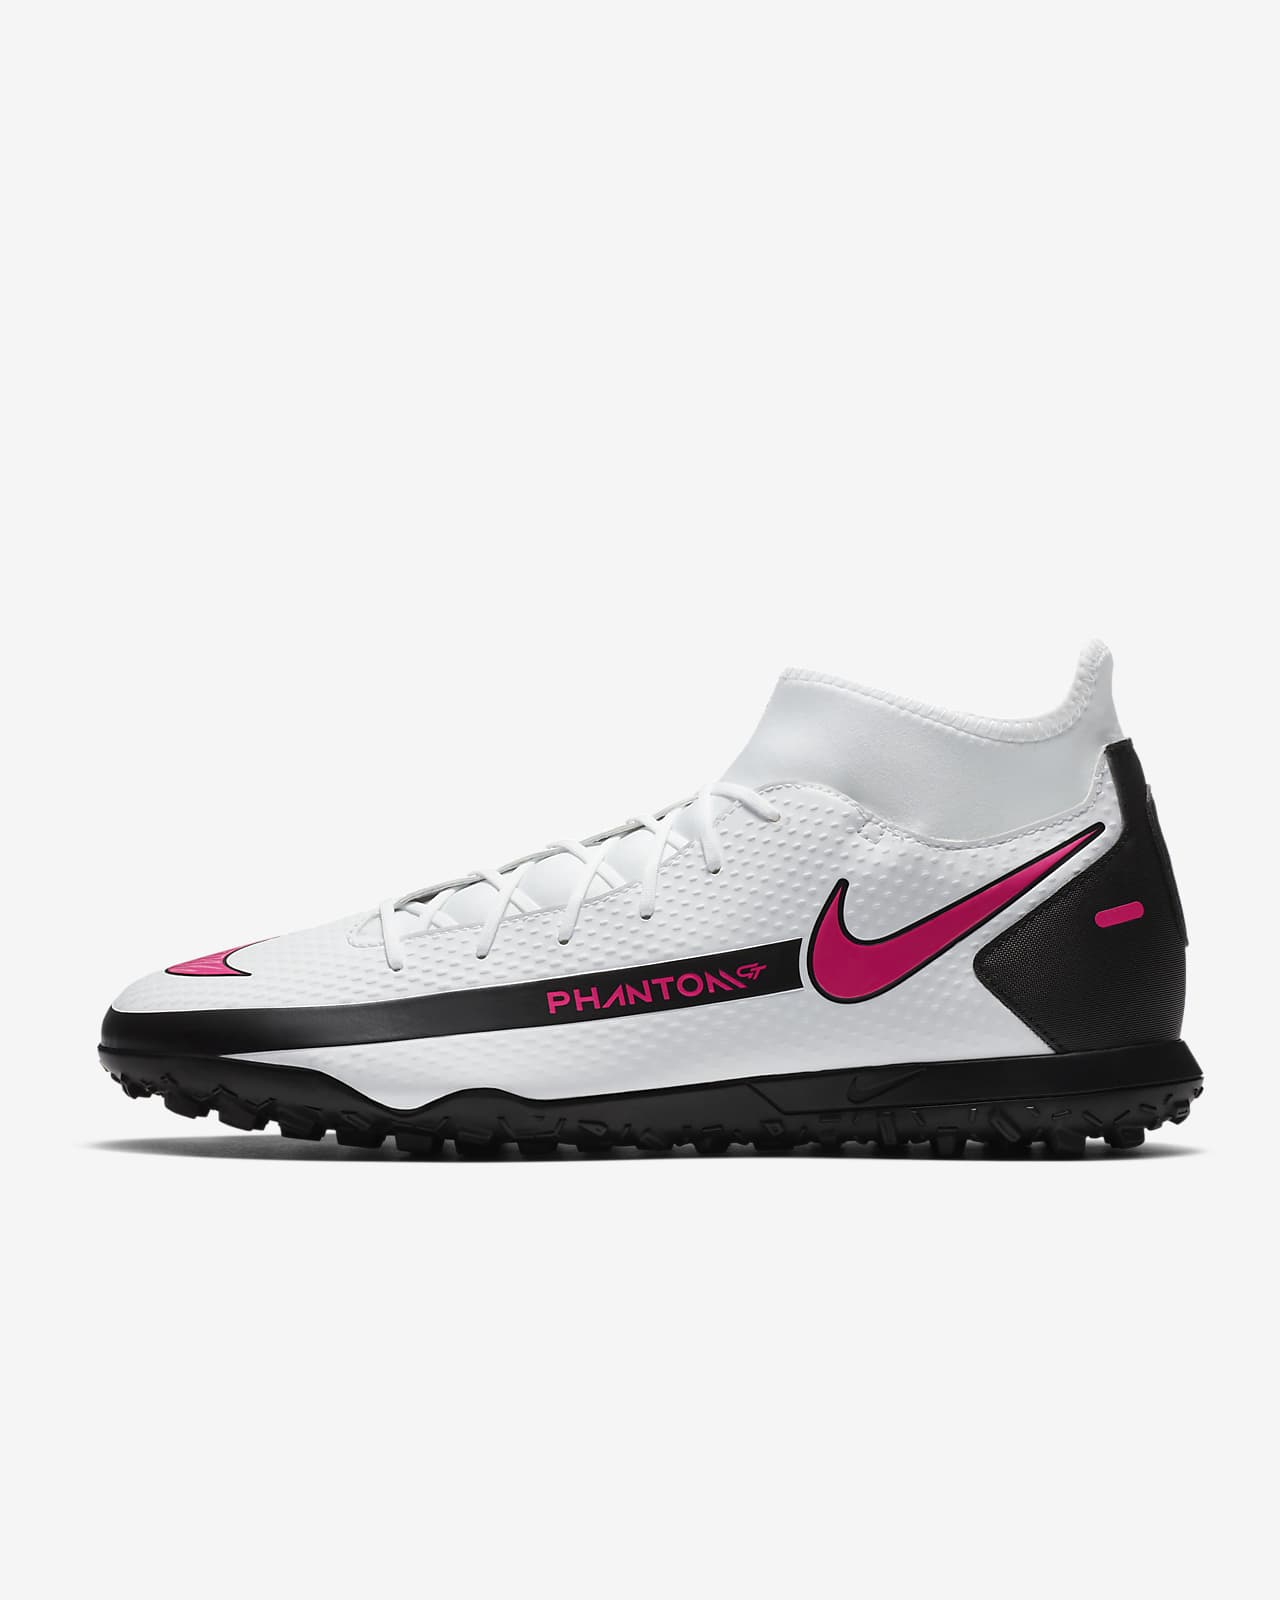 Laboratorio Excursión fluir  Nike Phantom GT Club Dynamic Fit TF Artificial-Turf Football Shoe. Nike SI